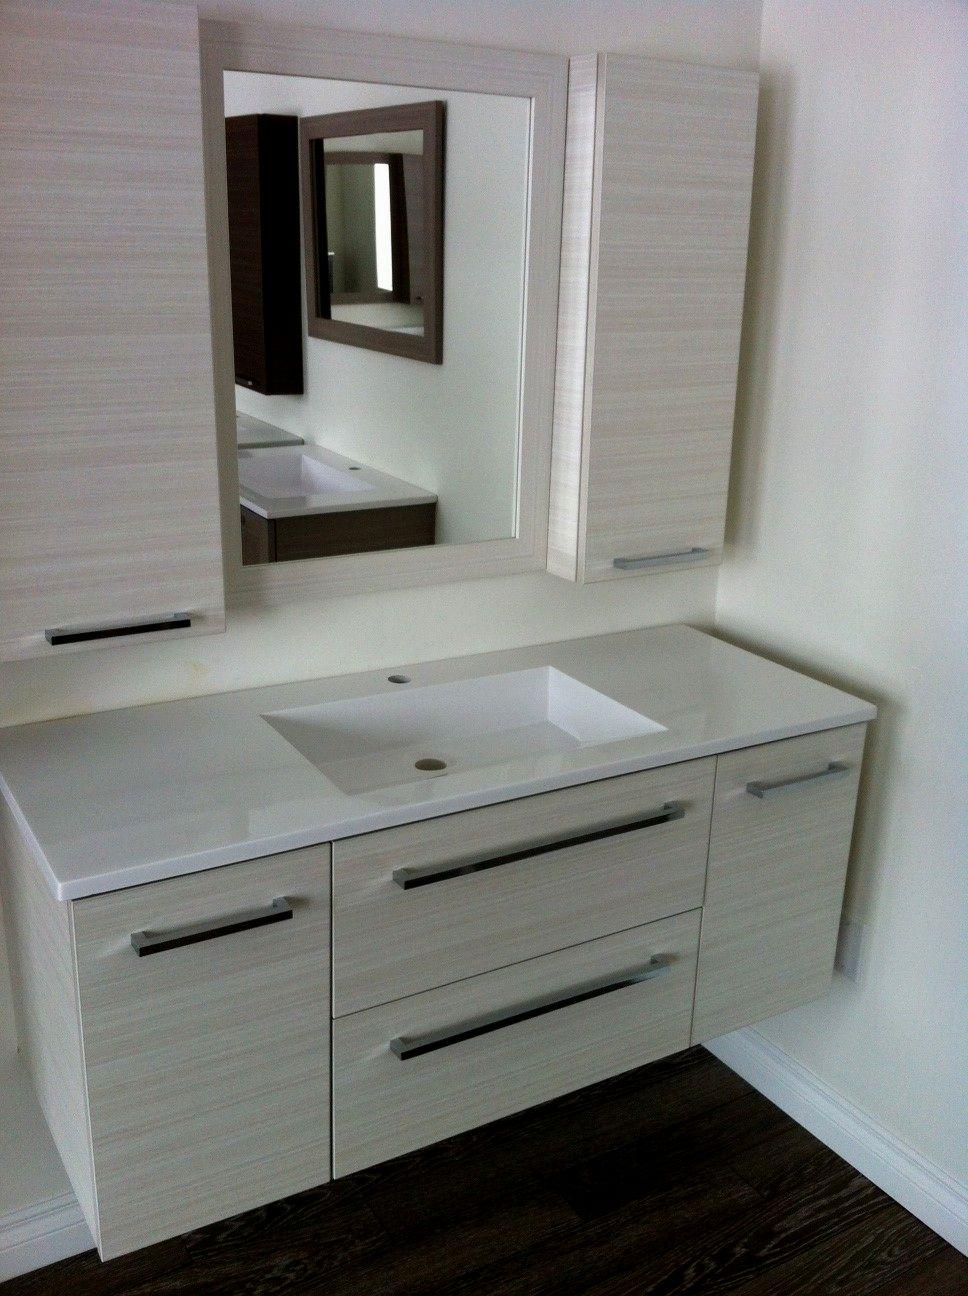 superb floating bathroom vanity picture-Amazing Floating Bathroom Vanity Construction